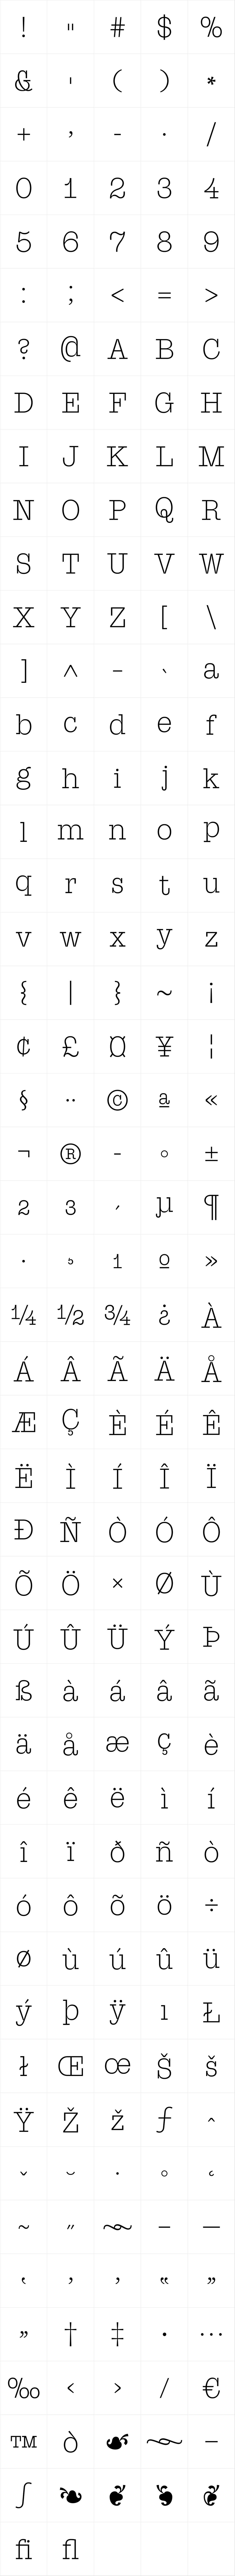 Suomi Slab Serif Light